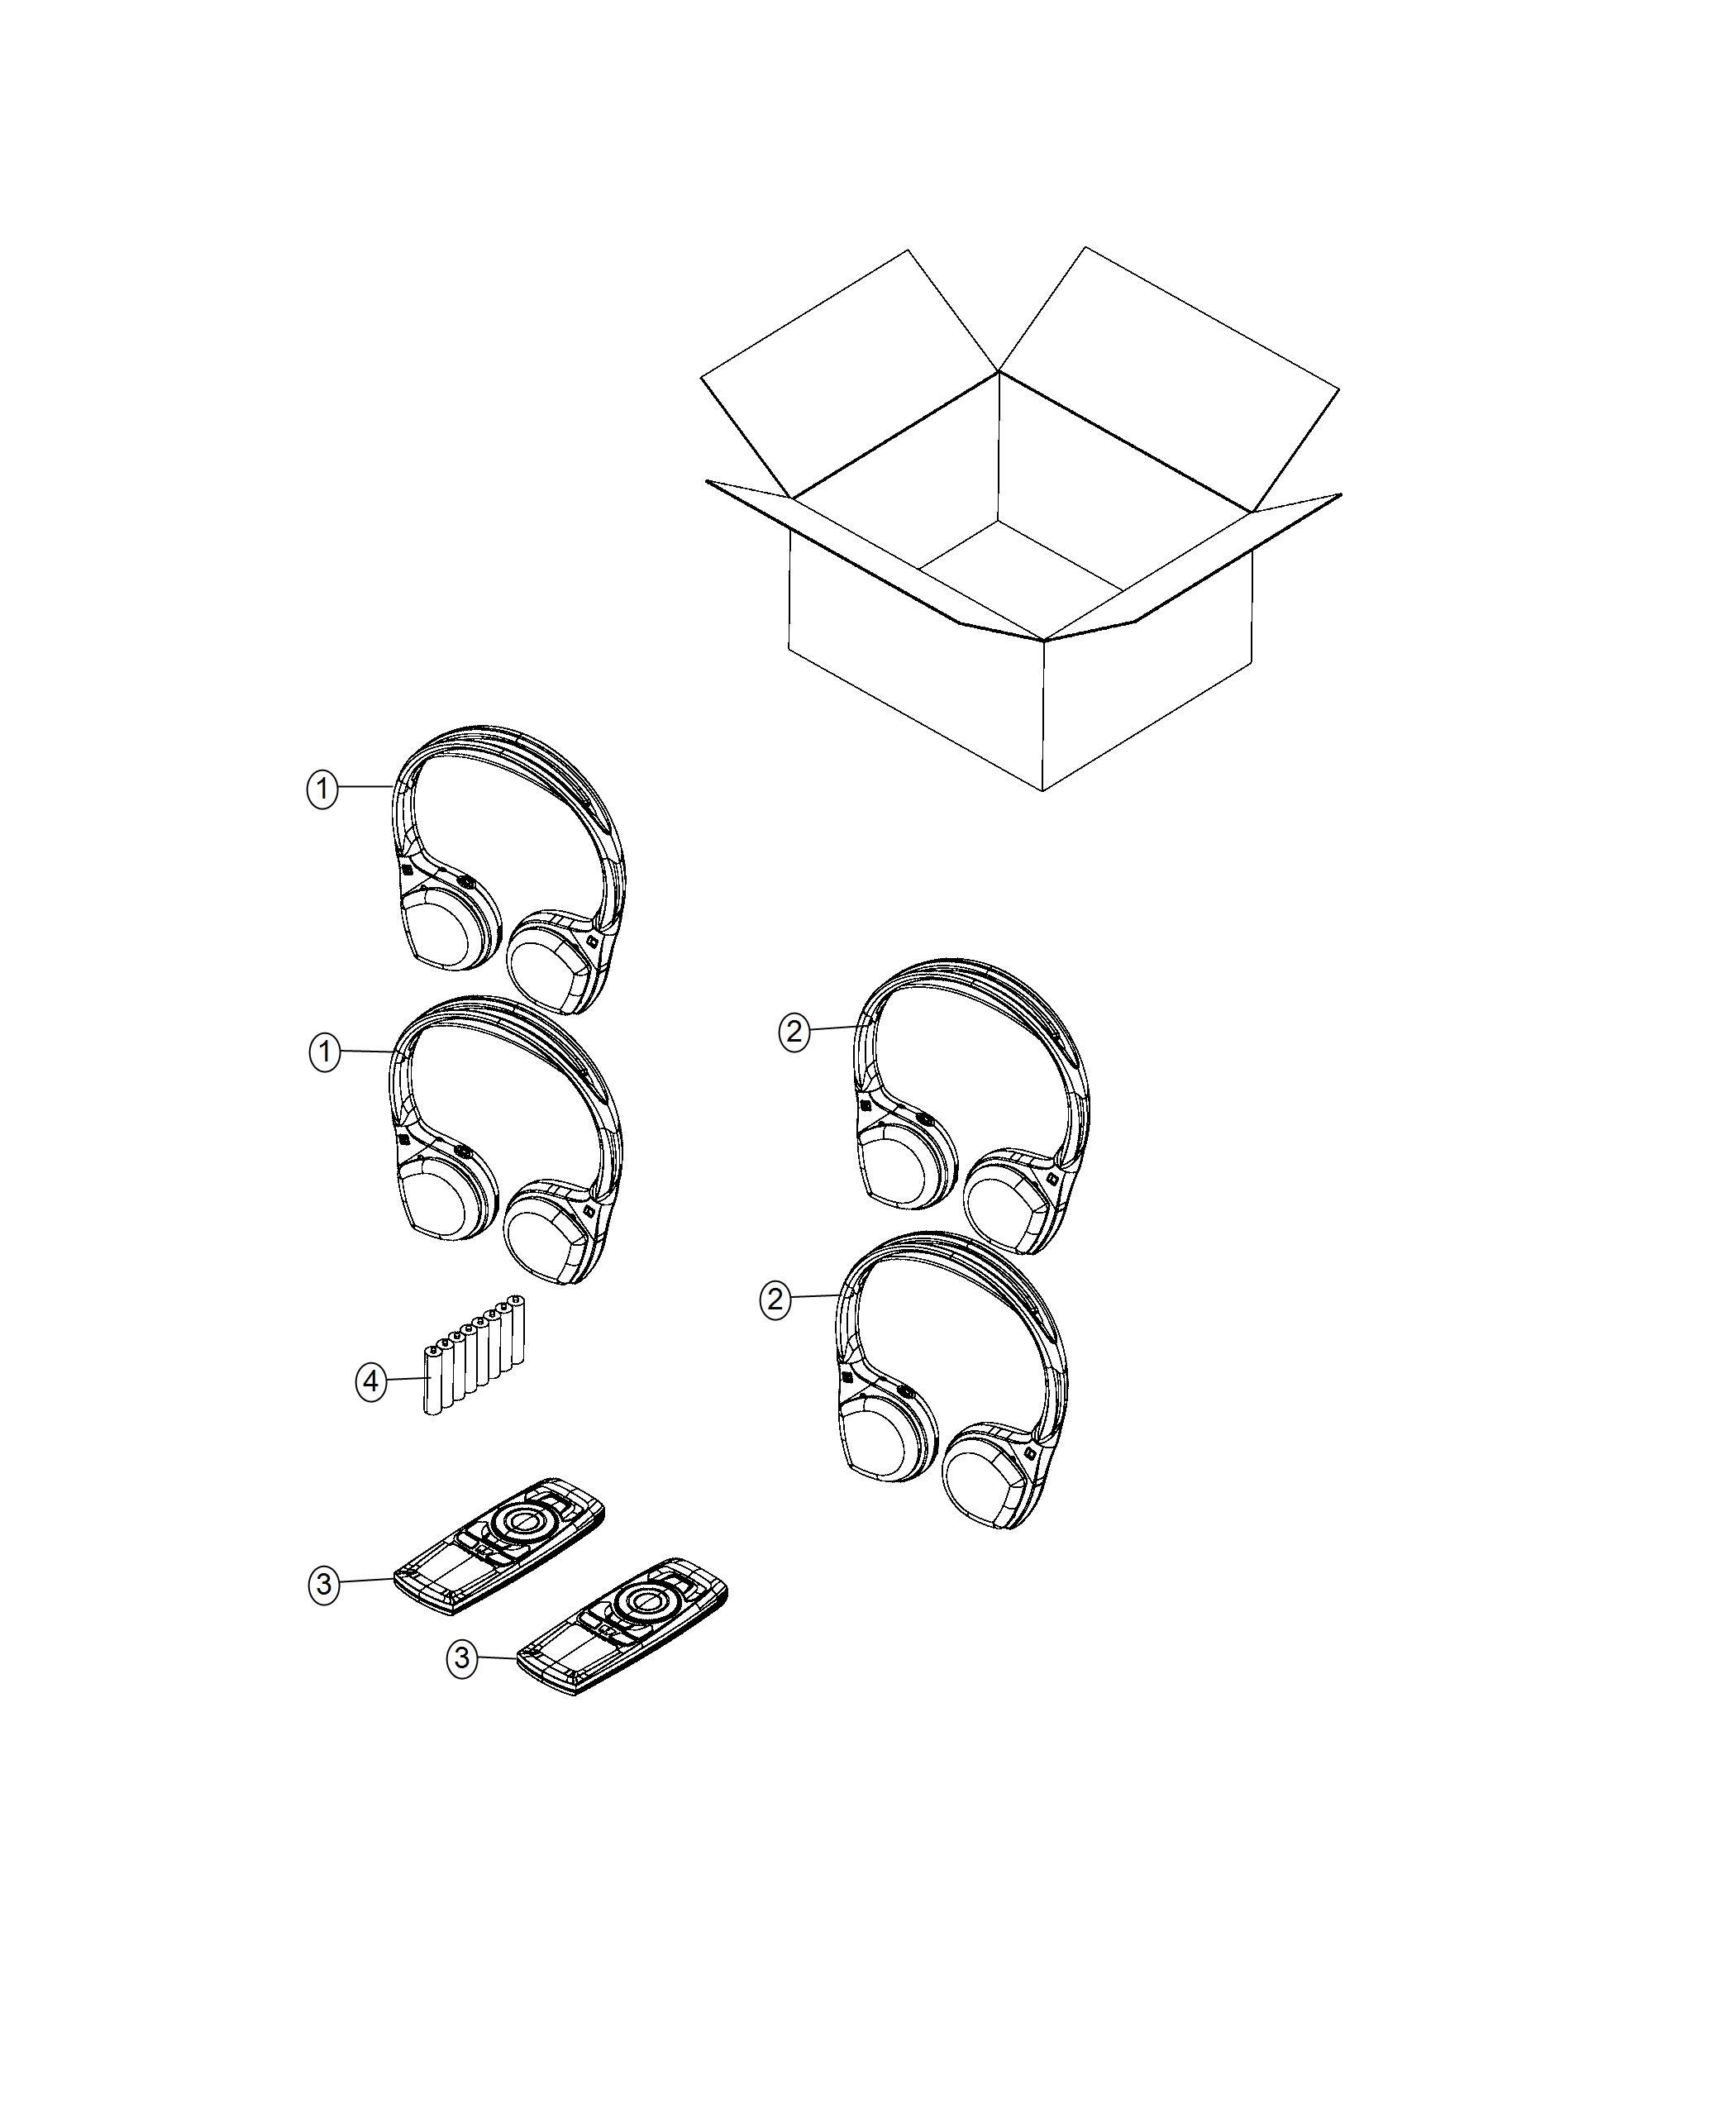 Chrysler Pacifica L Hybrid Headphones Wireless Video